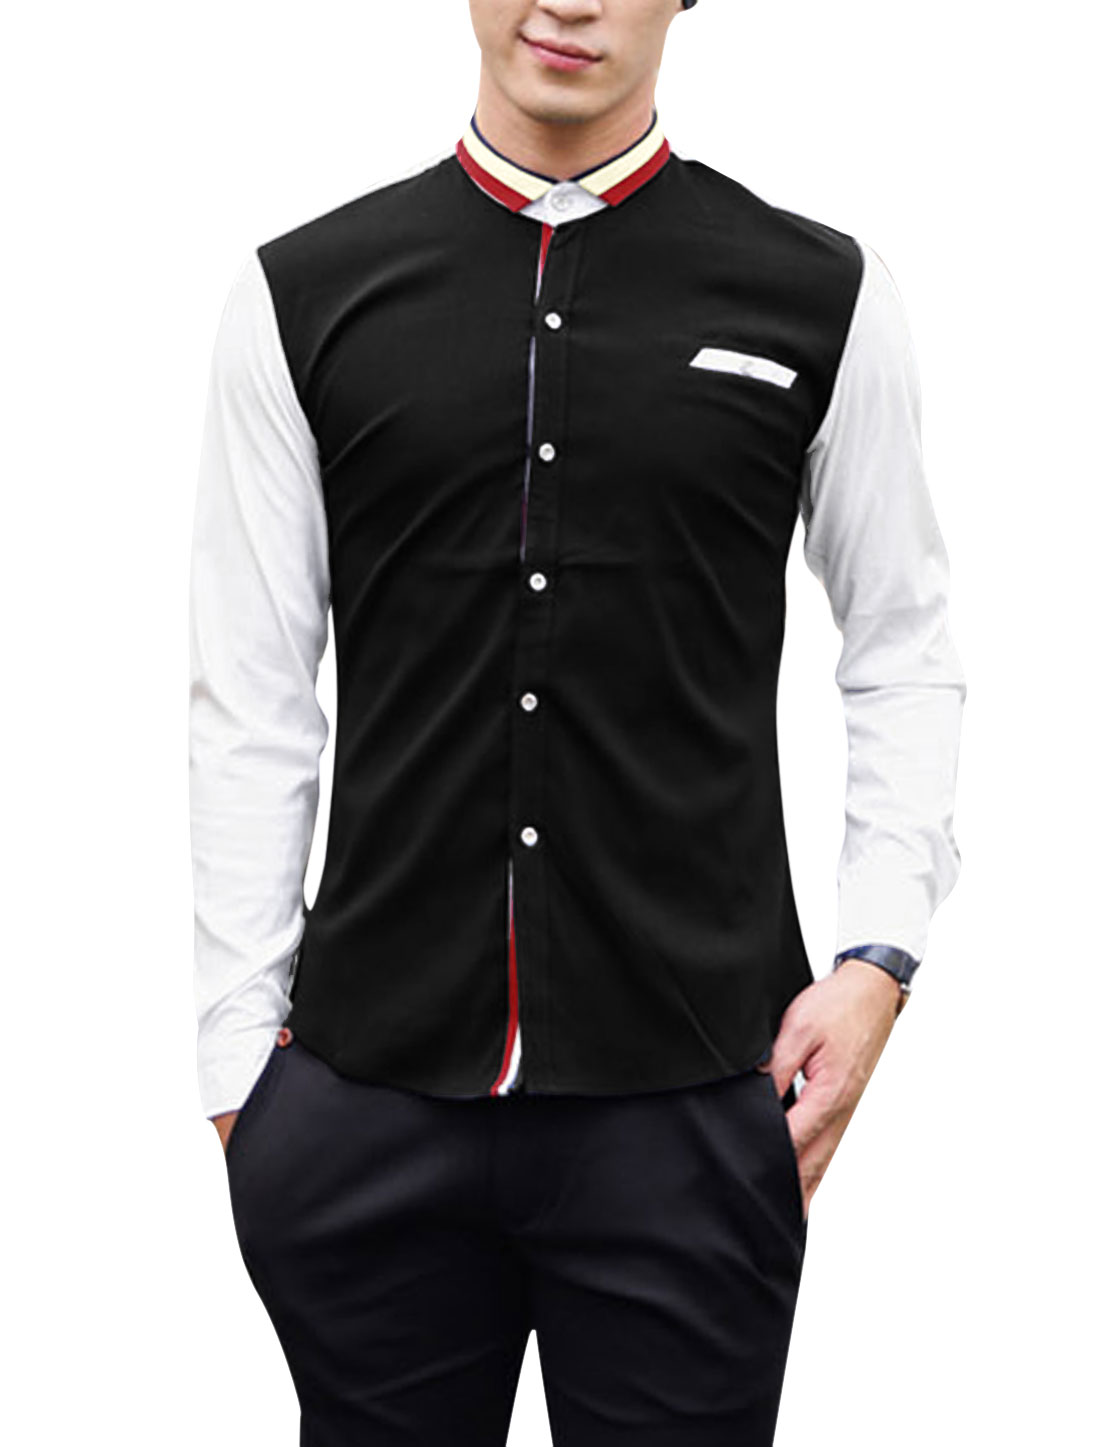 Men Stripes Ribbed Detail Contrast Long Sleeves Leisure Shirt Black M